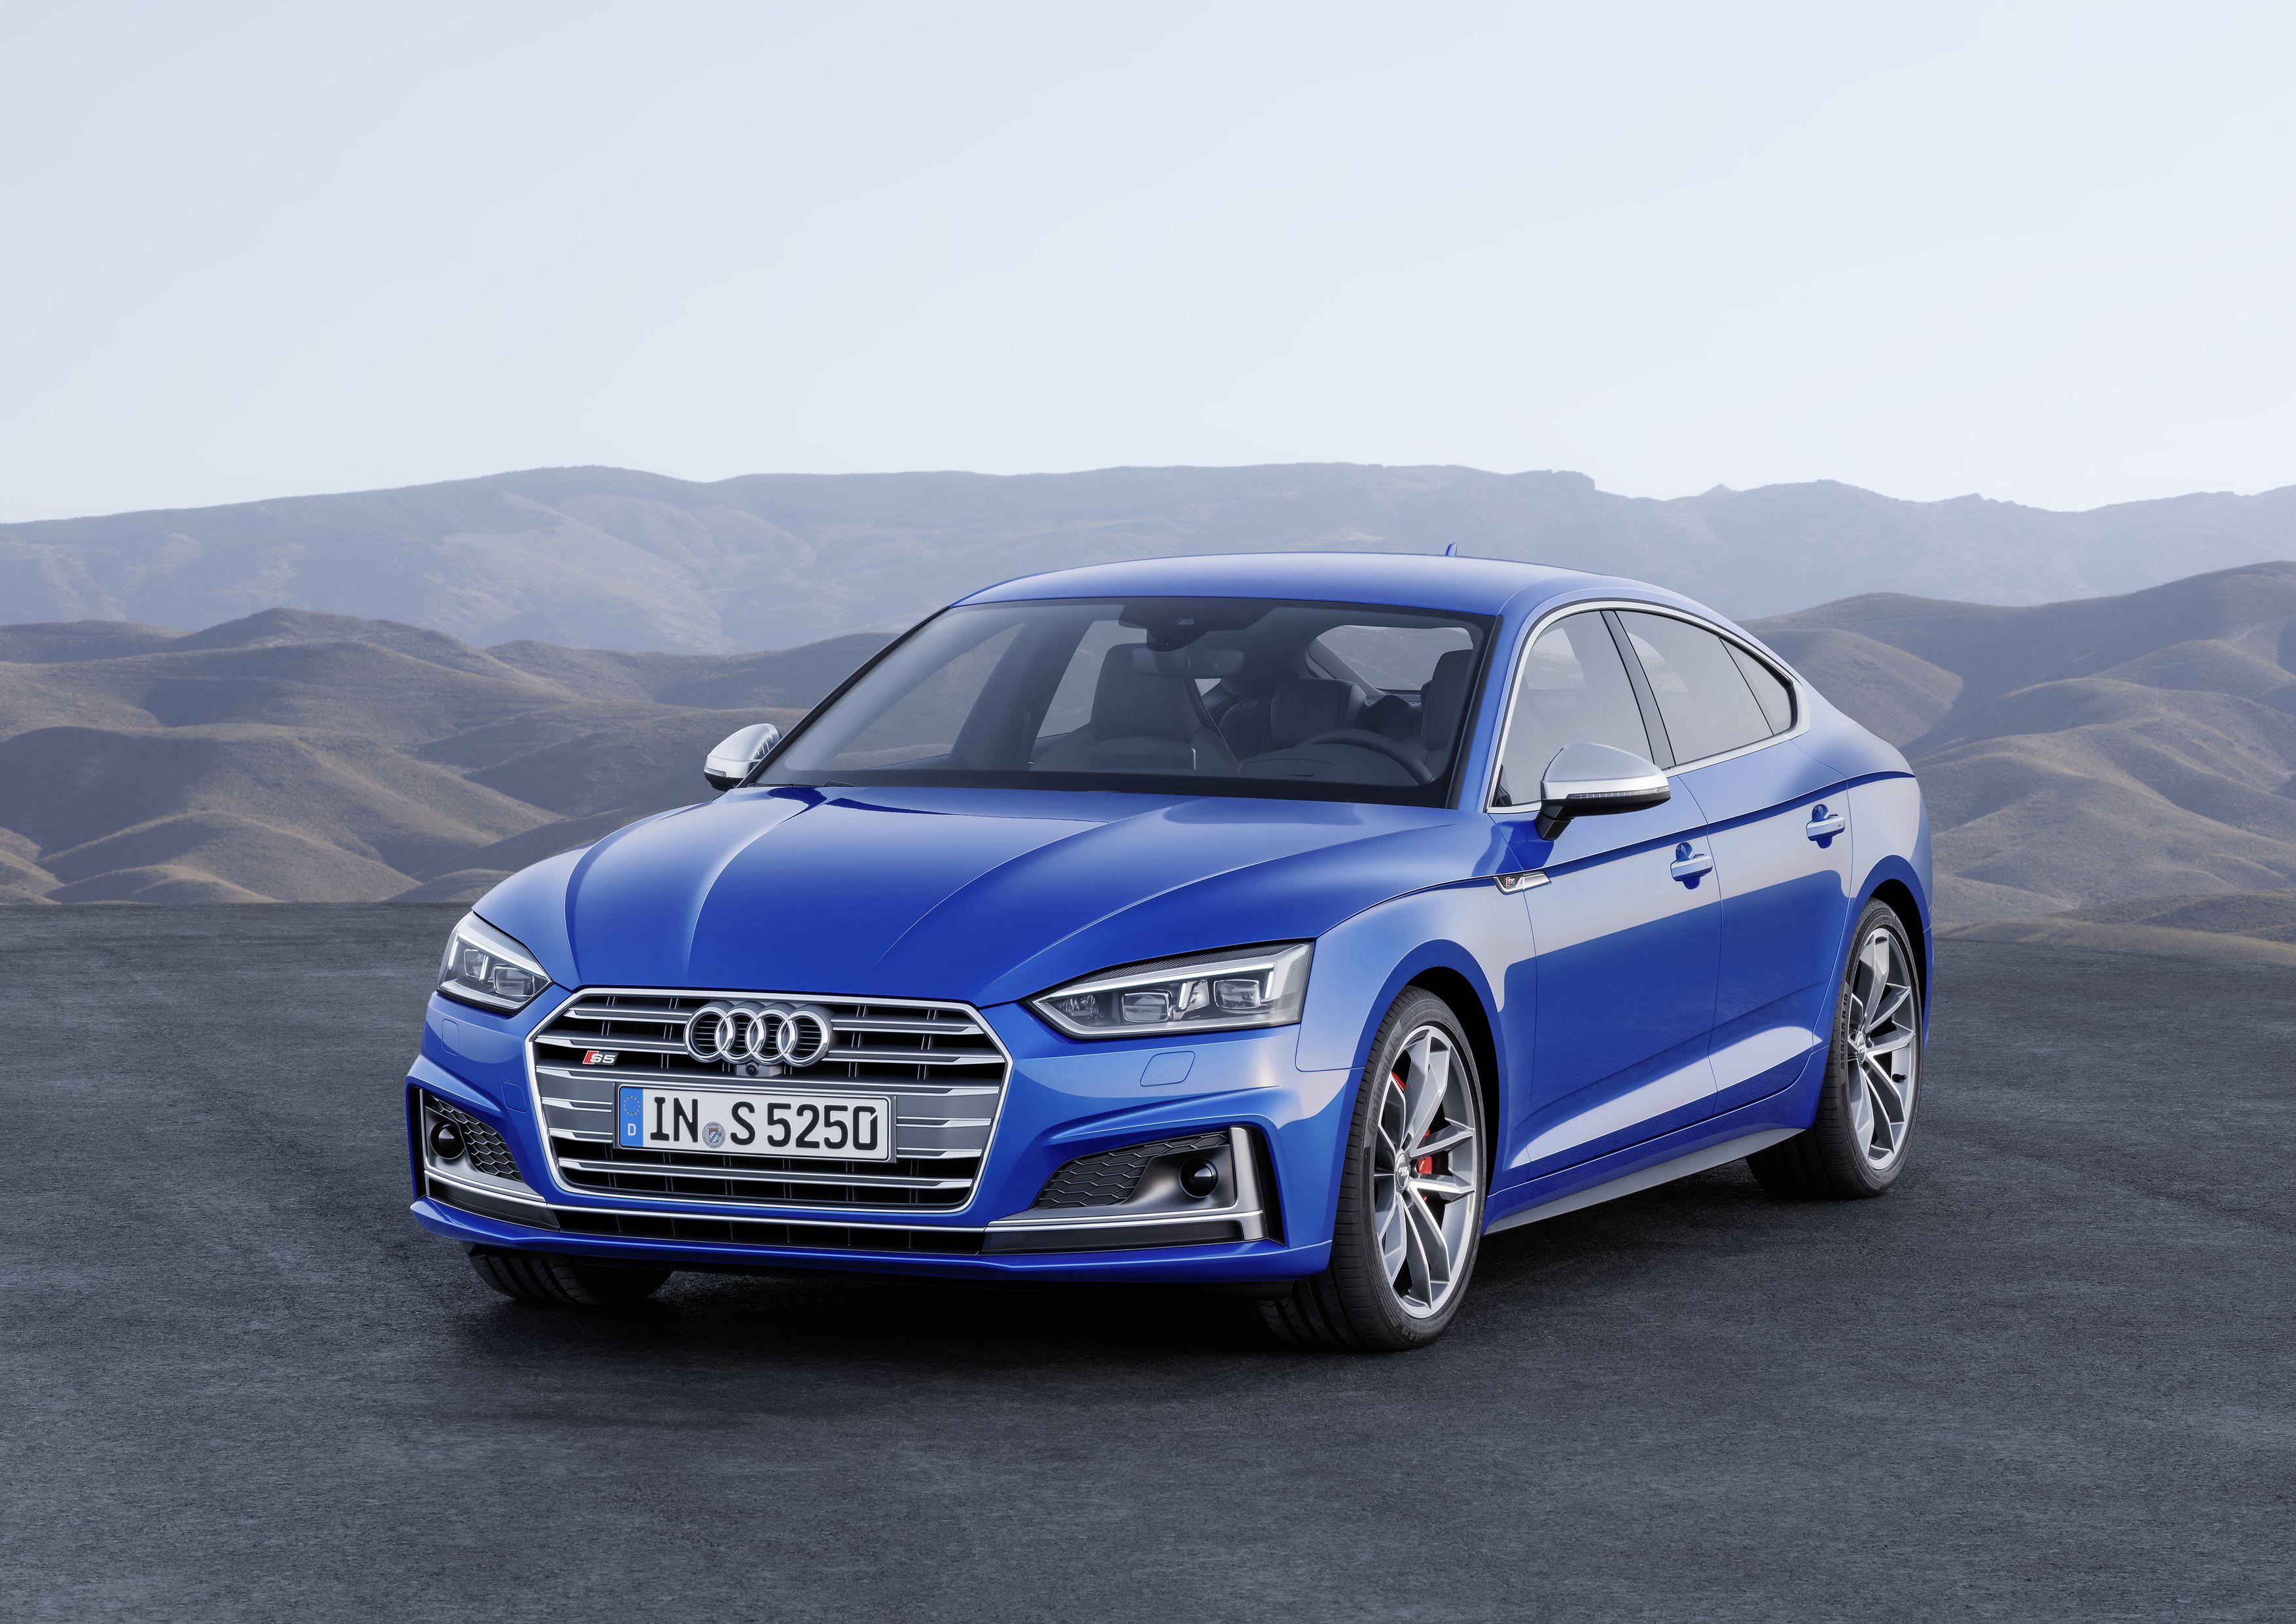 Audi S5 Sportback To Make American Debut This Spring Audi S5 Audi S5 Sportback Audi A5